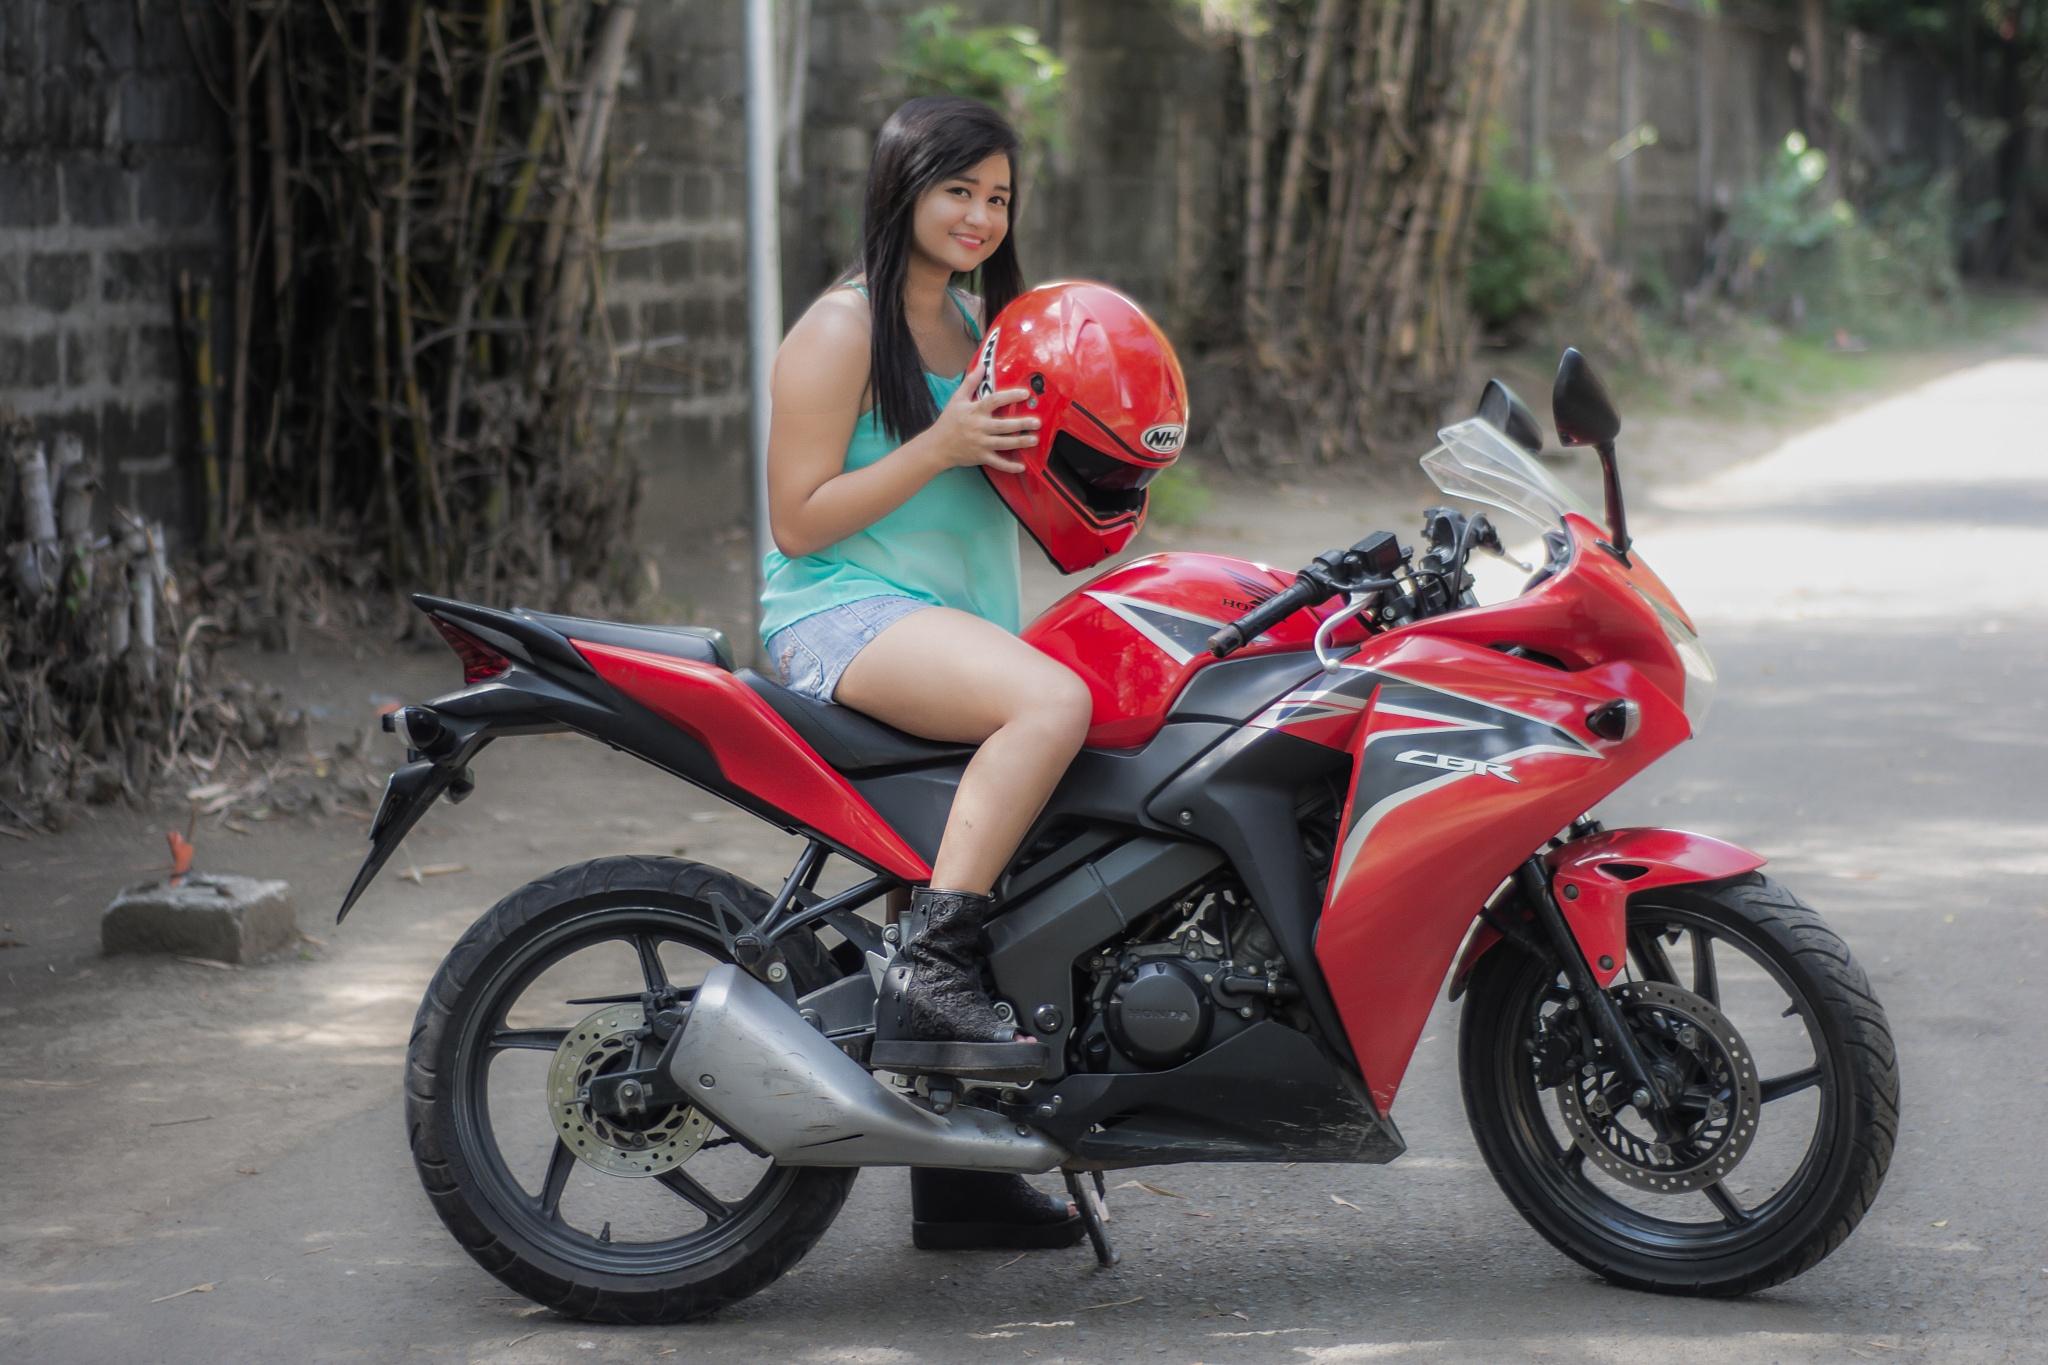 Motorcycle Rider girl by ariel.ladrido.9